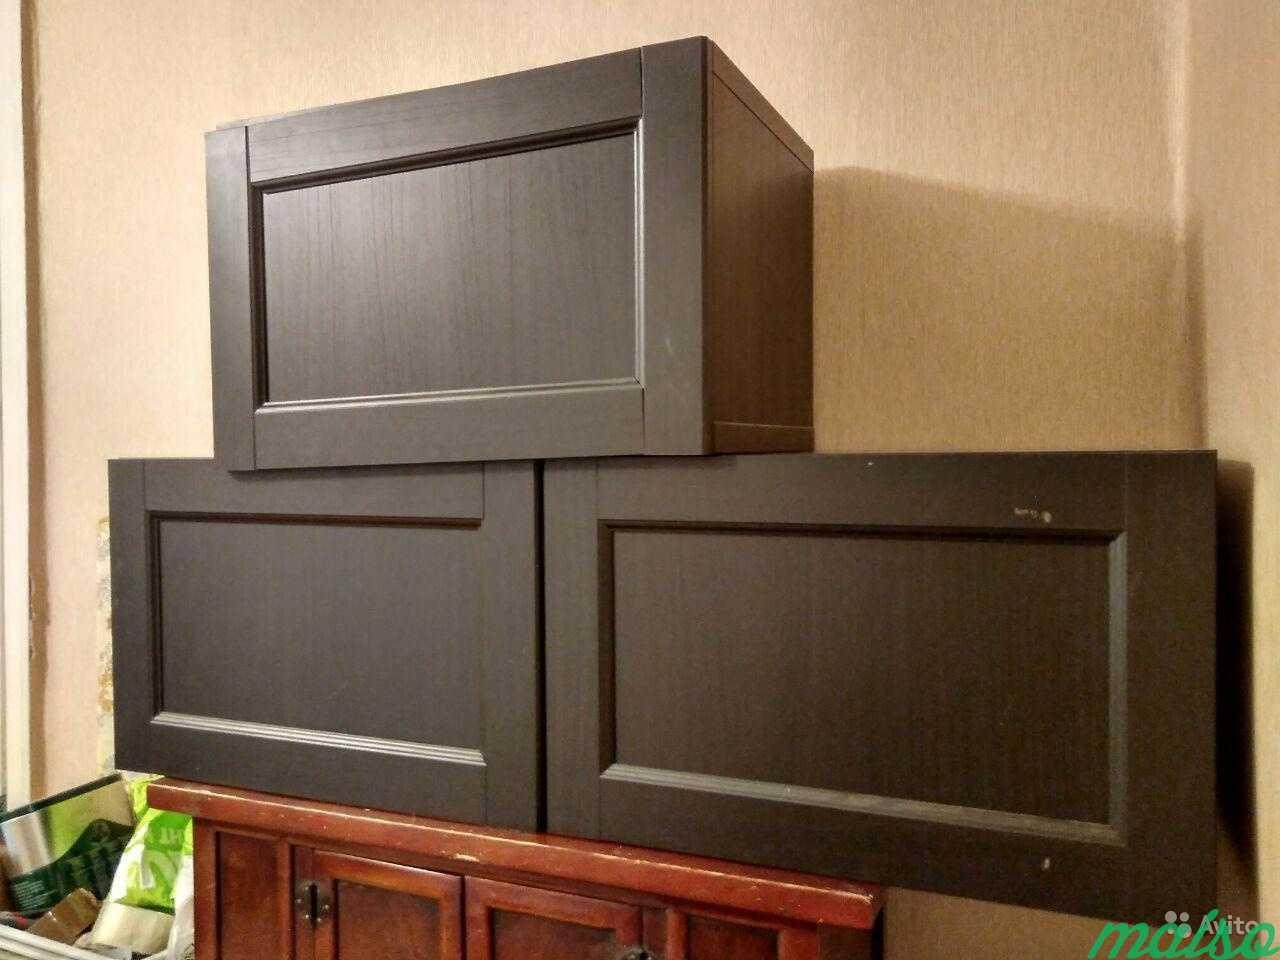 Система шкафов IKEA besta в Москве. Фото 6